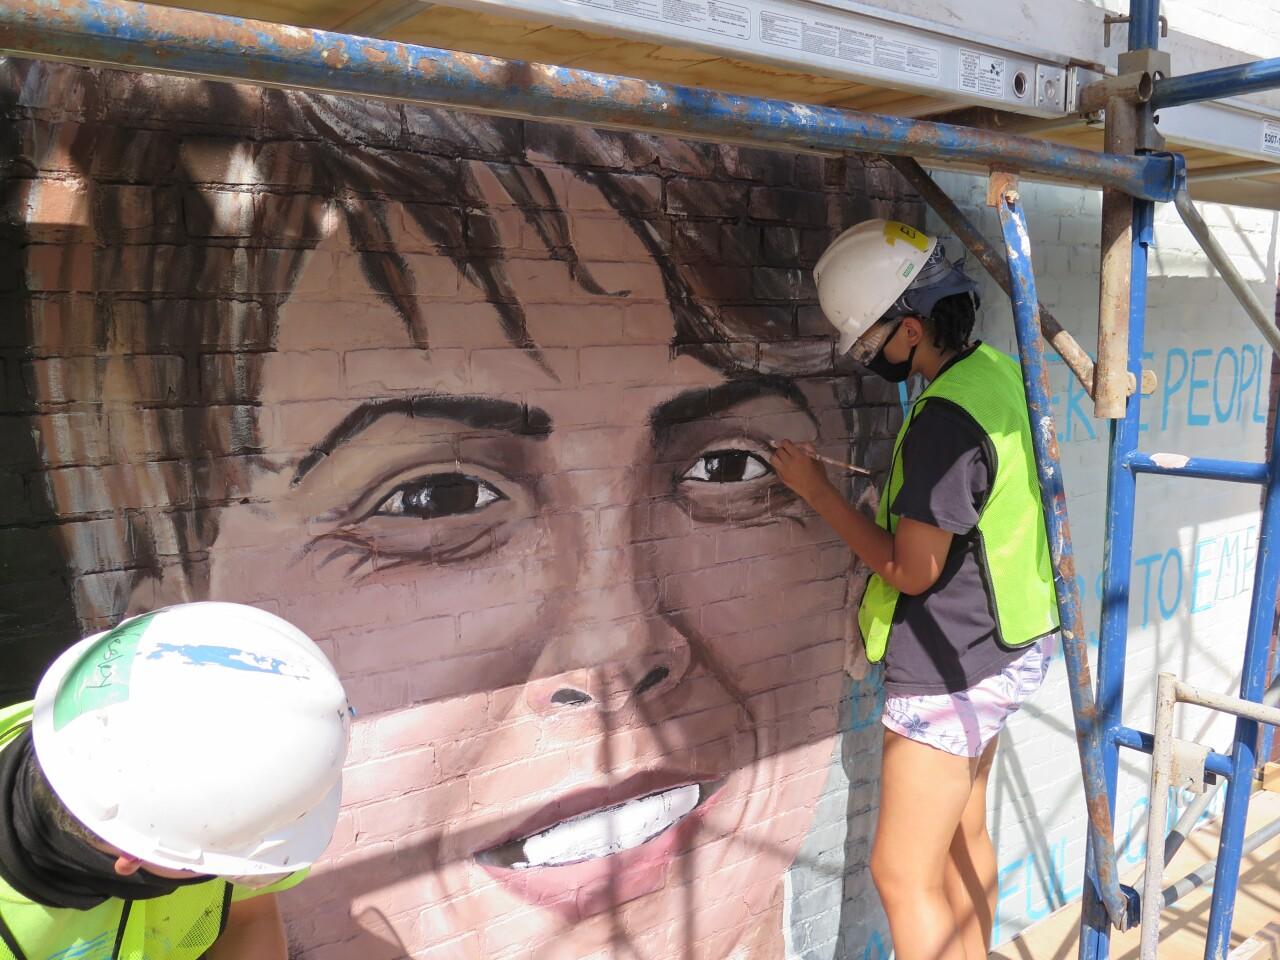 apprentice_painting_time_saved_mural.JPG